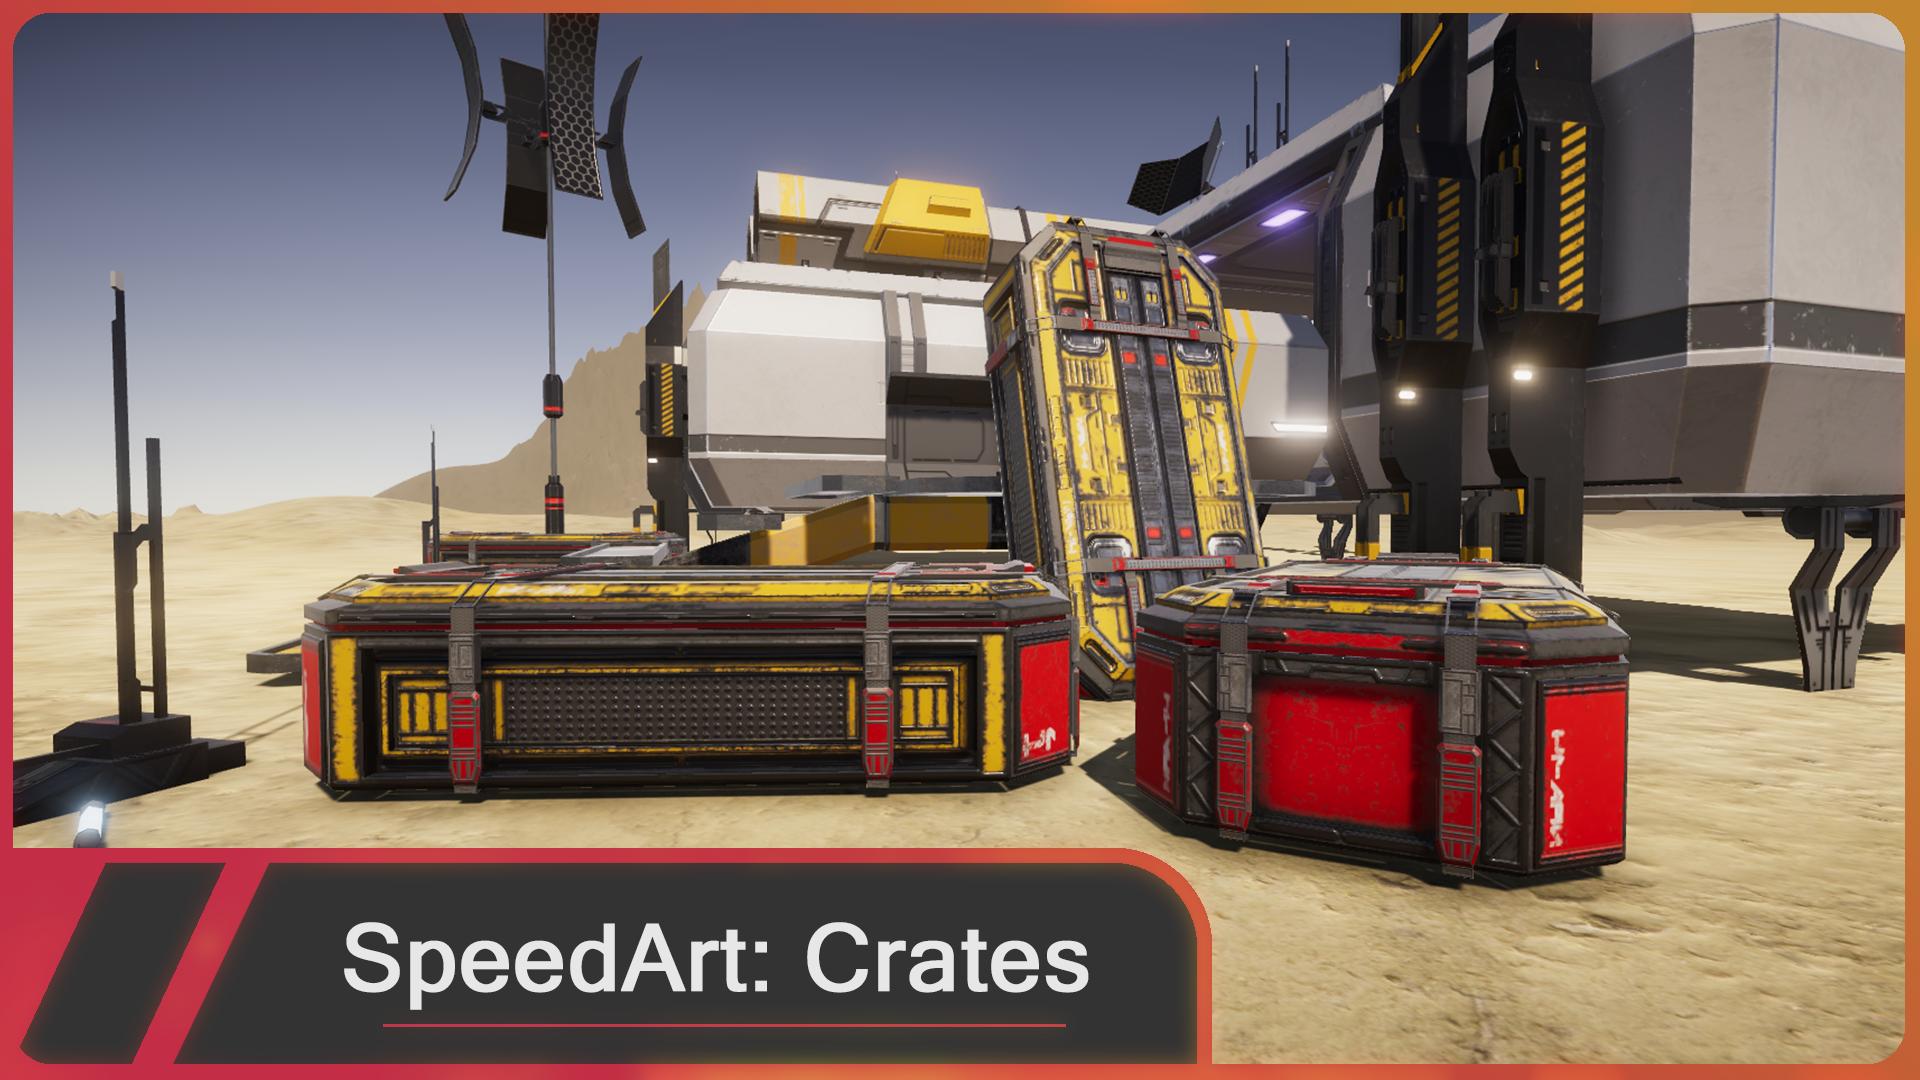 Blender SpeedArt Crate (Blender,Substance painter, Unity)